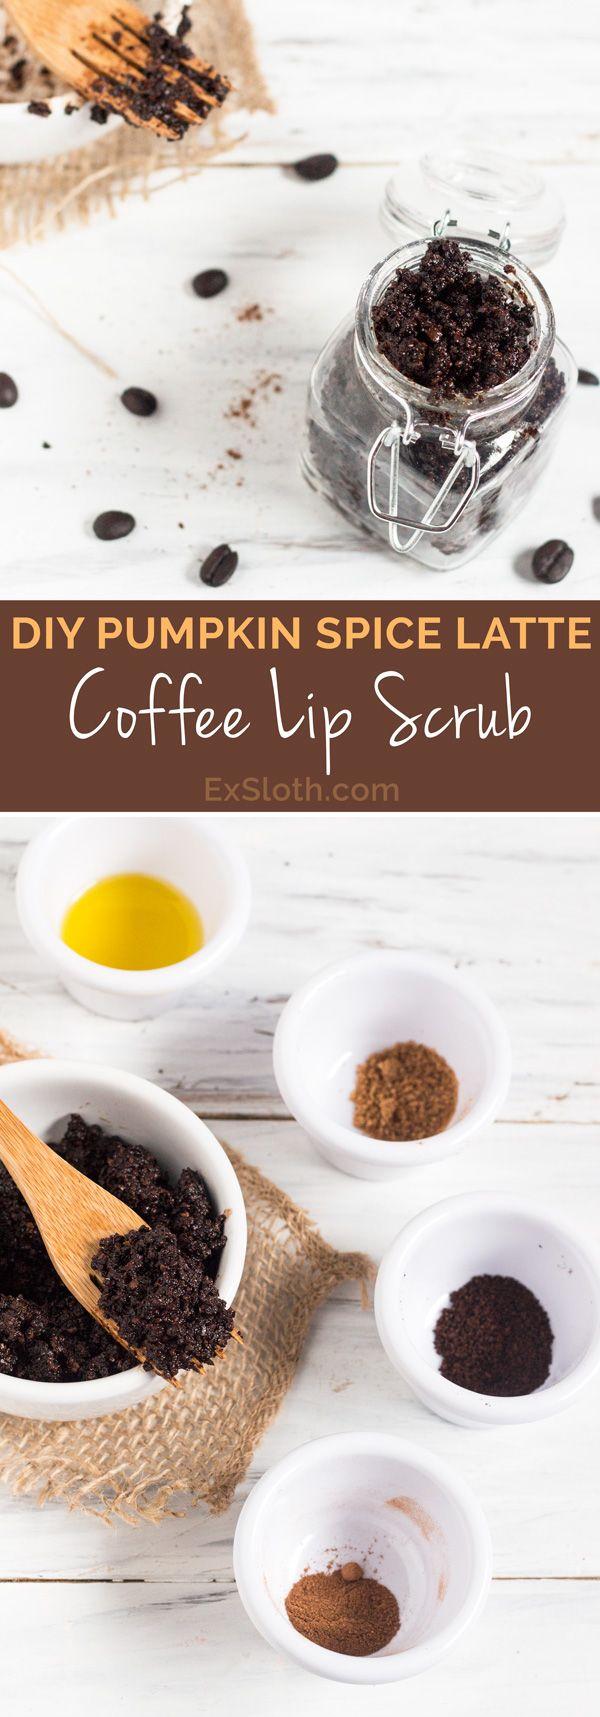 ¼ cup coarsely ground coffee beans 1 tbsp brown sugar 1 tbsp pumpkin pie spice 2½ tbsp carrier oil 1 tsp vanilla extract